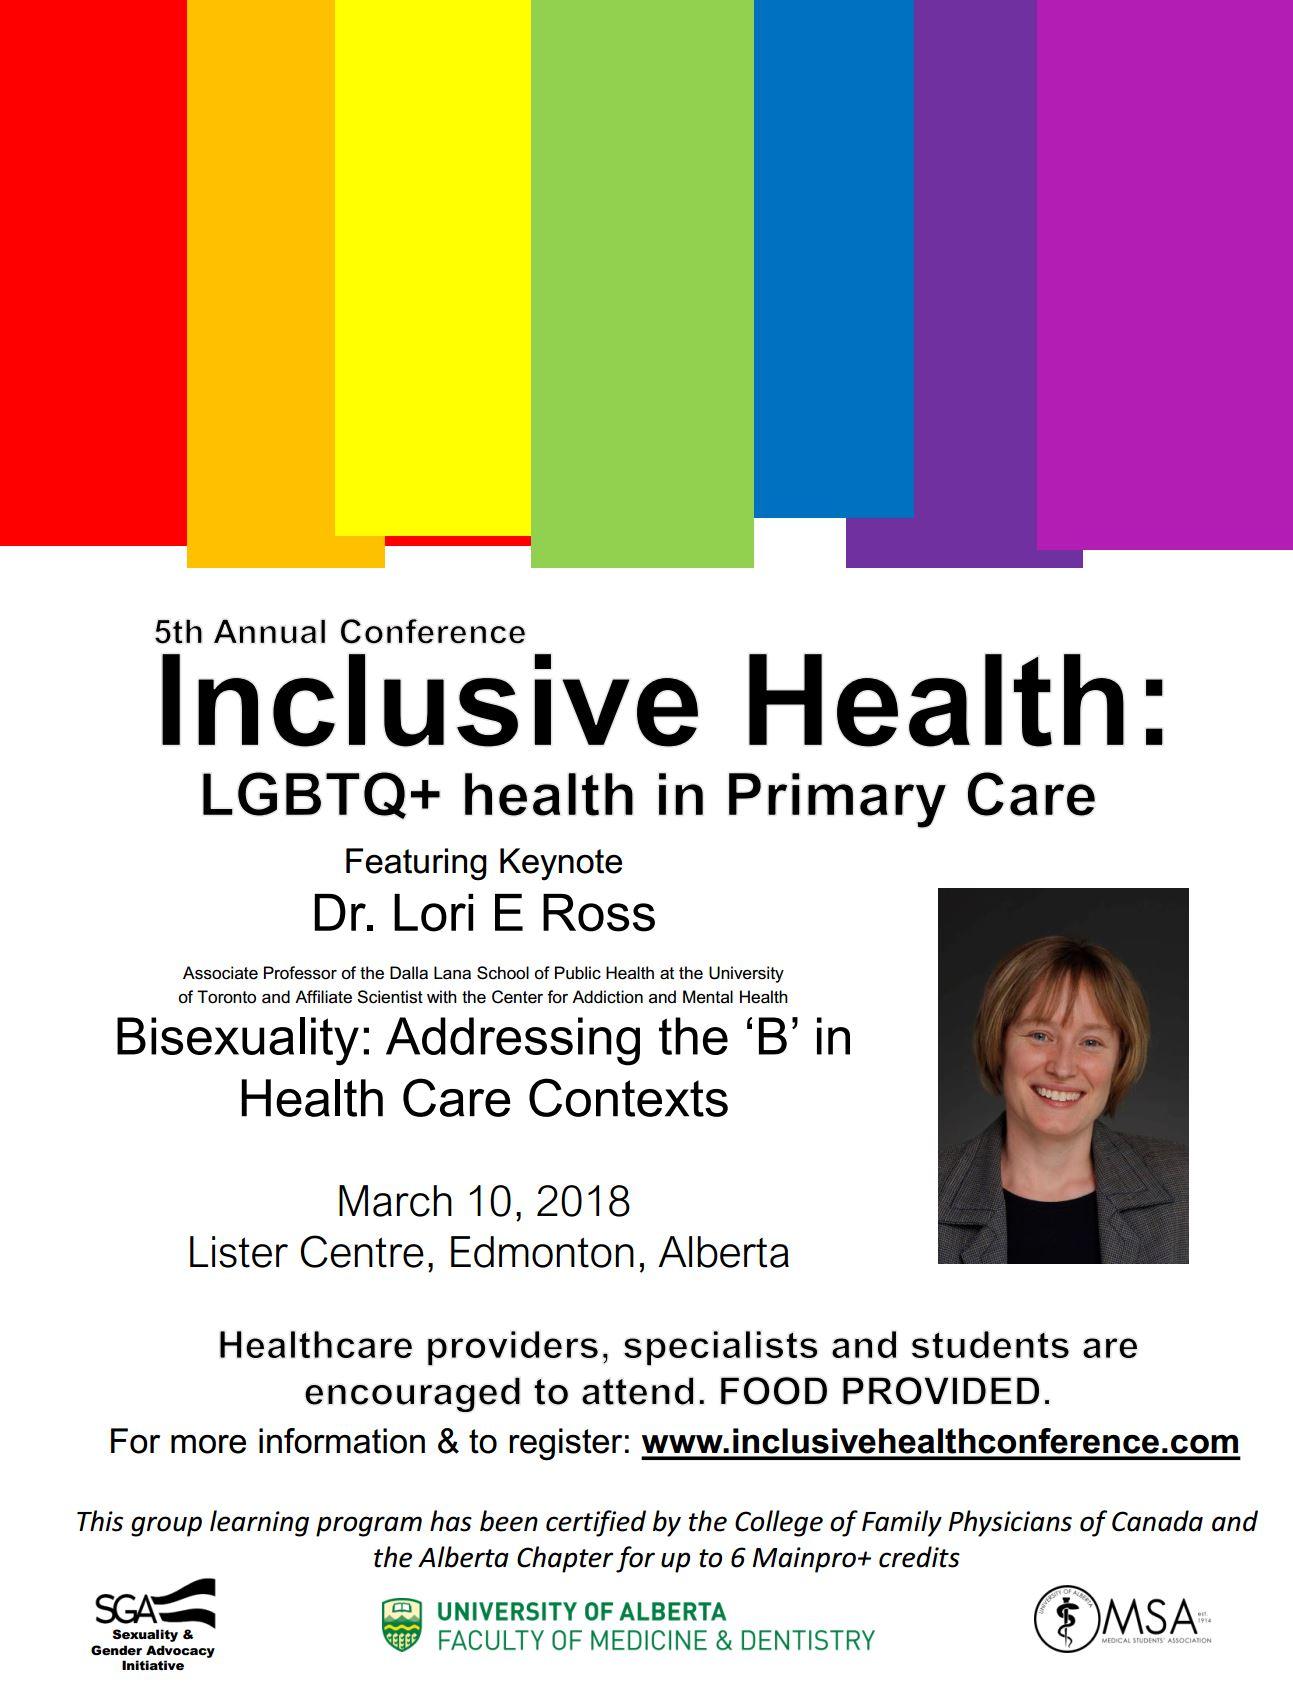 Inclusive Health Poster 2018 CME Final